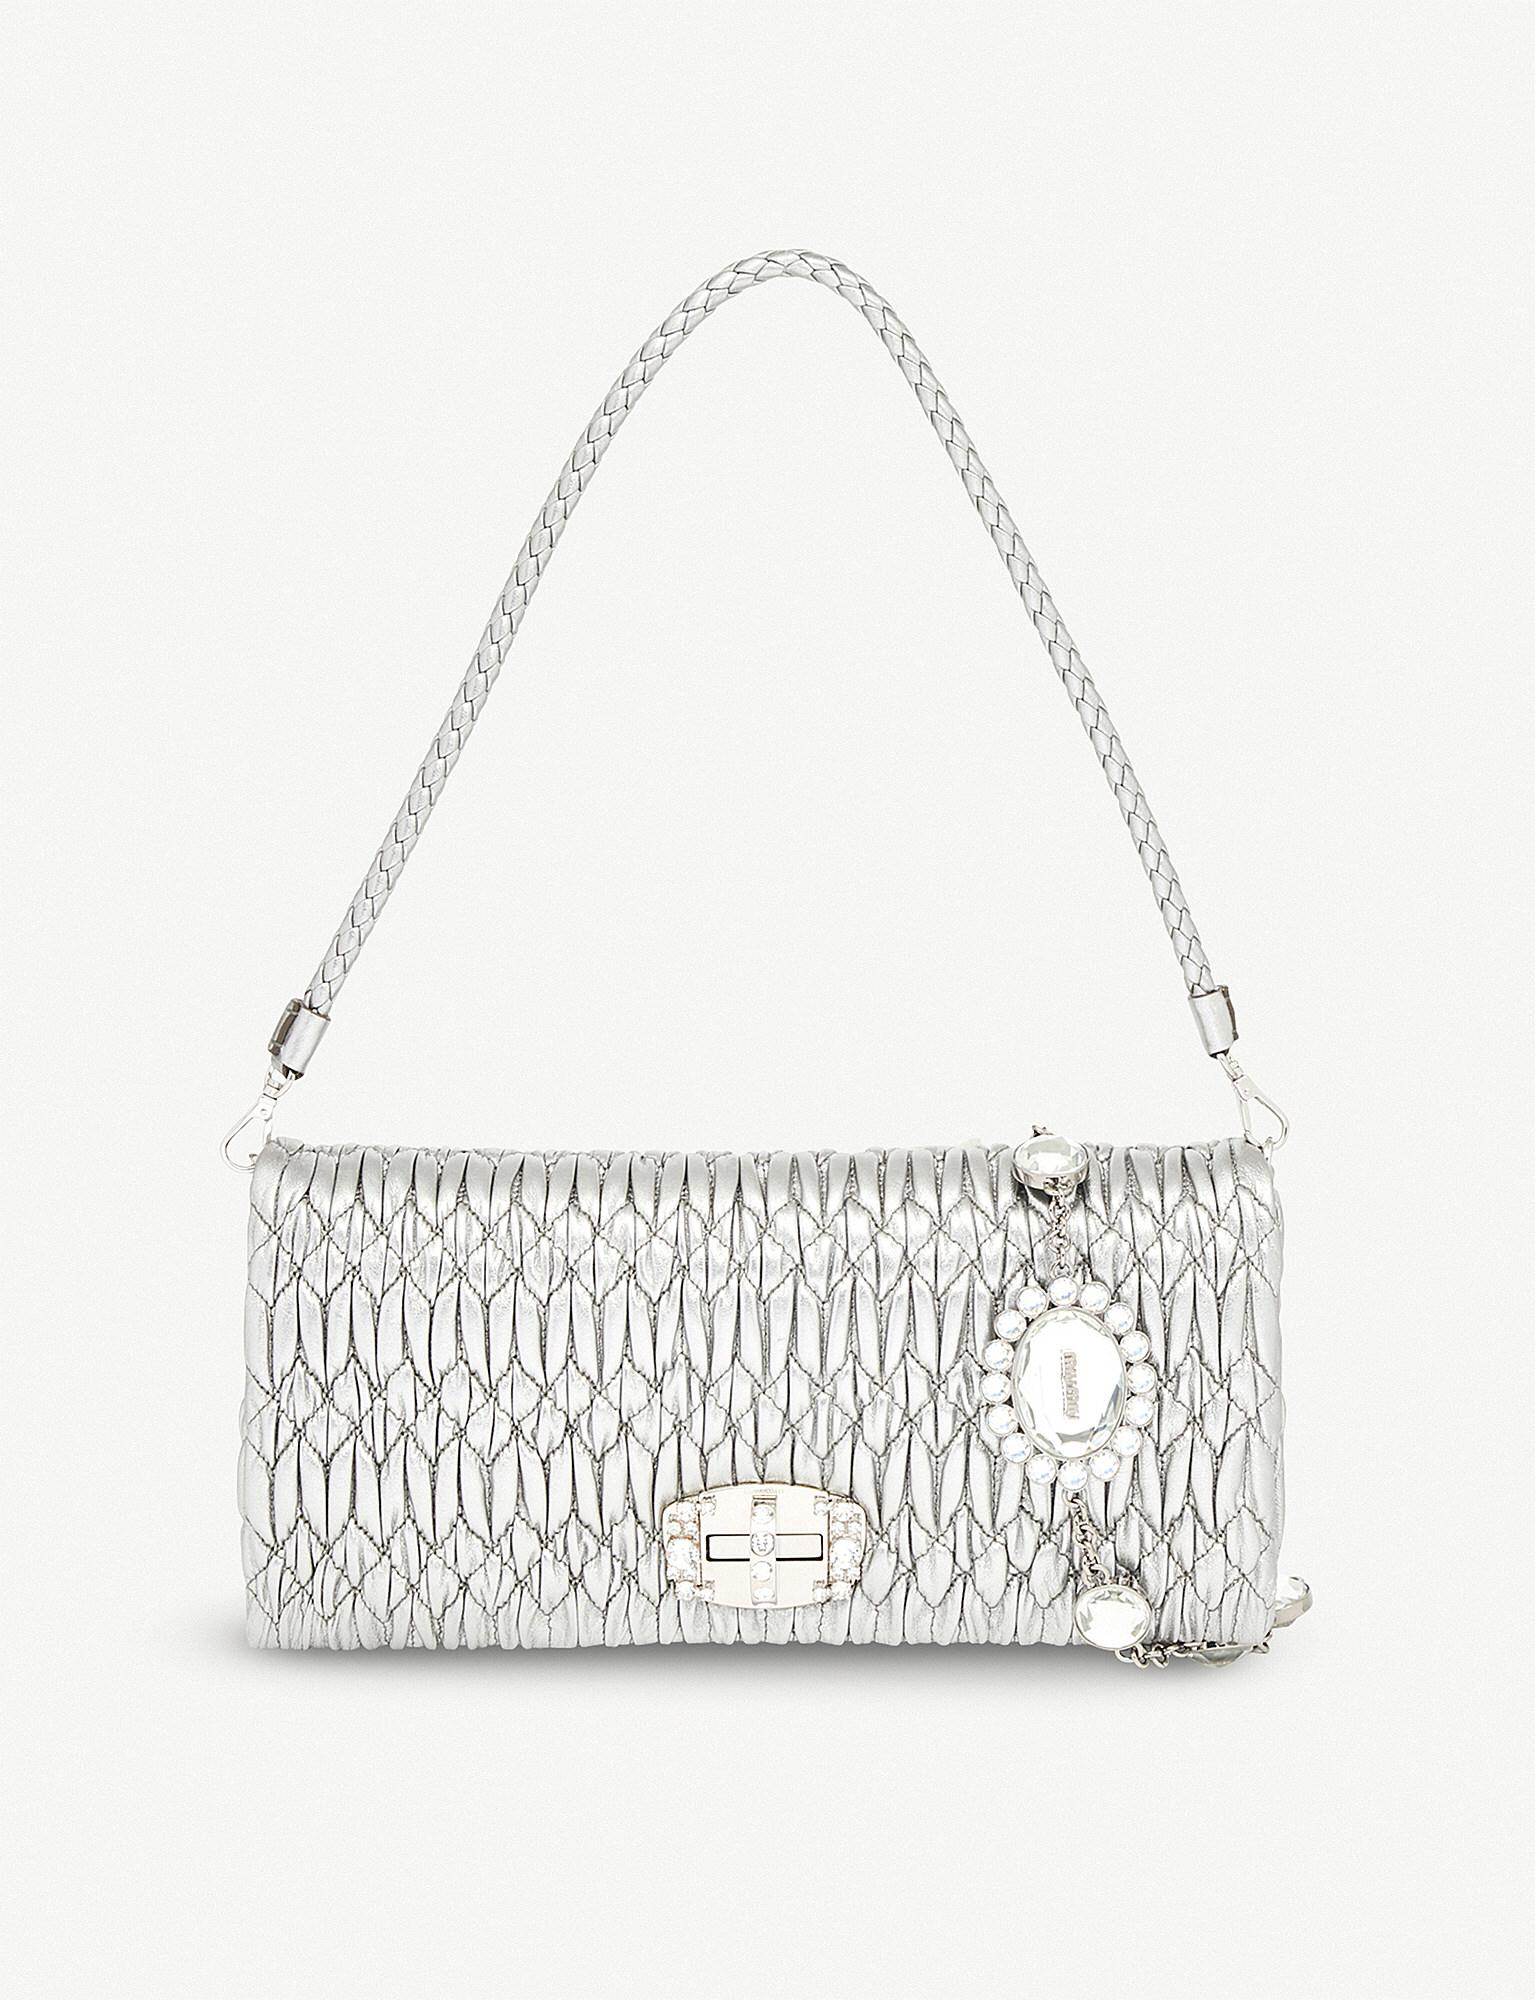 9eedceba6daaa Miu Miu - Multicolor Cloqué-texture Leather Clutch Bag - Lyst